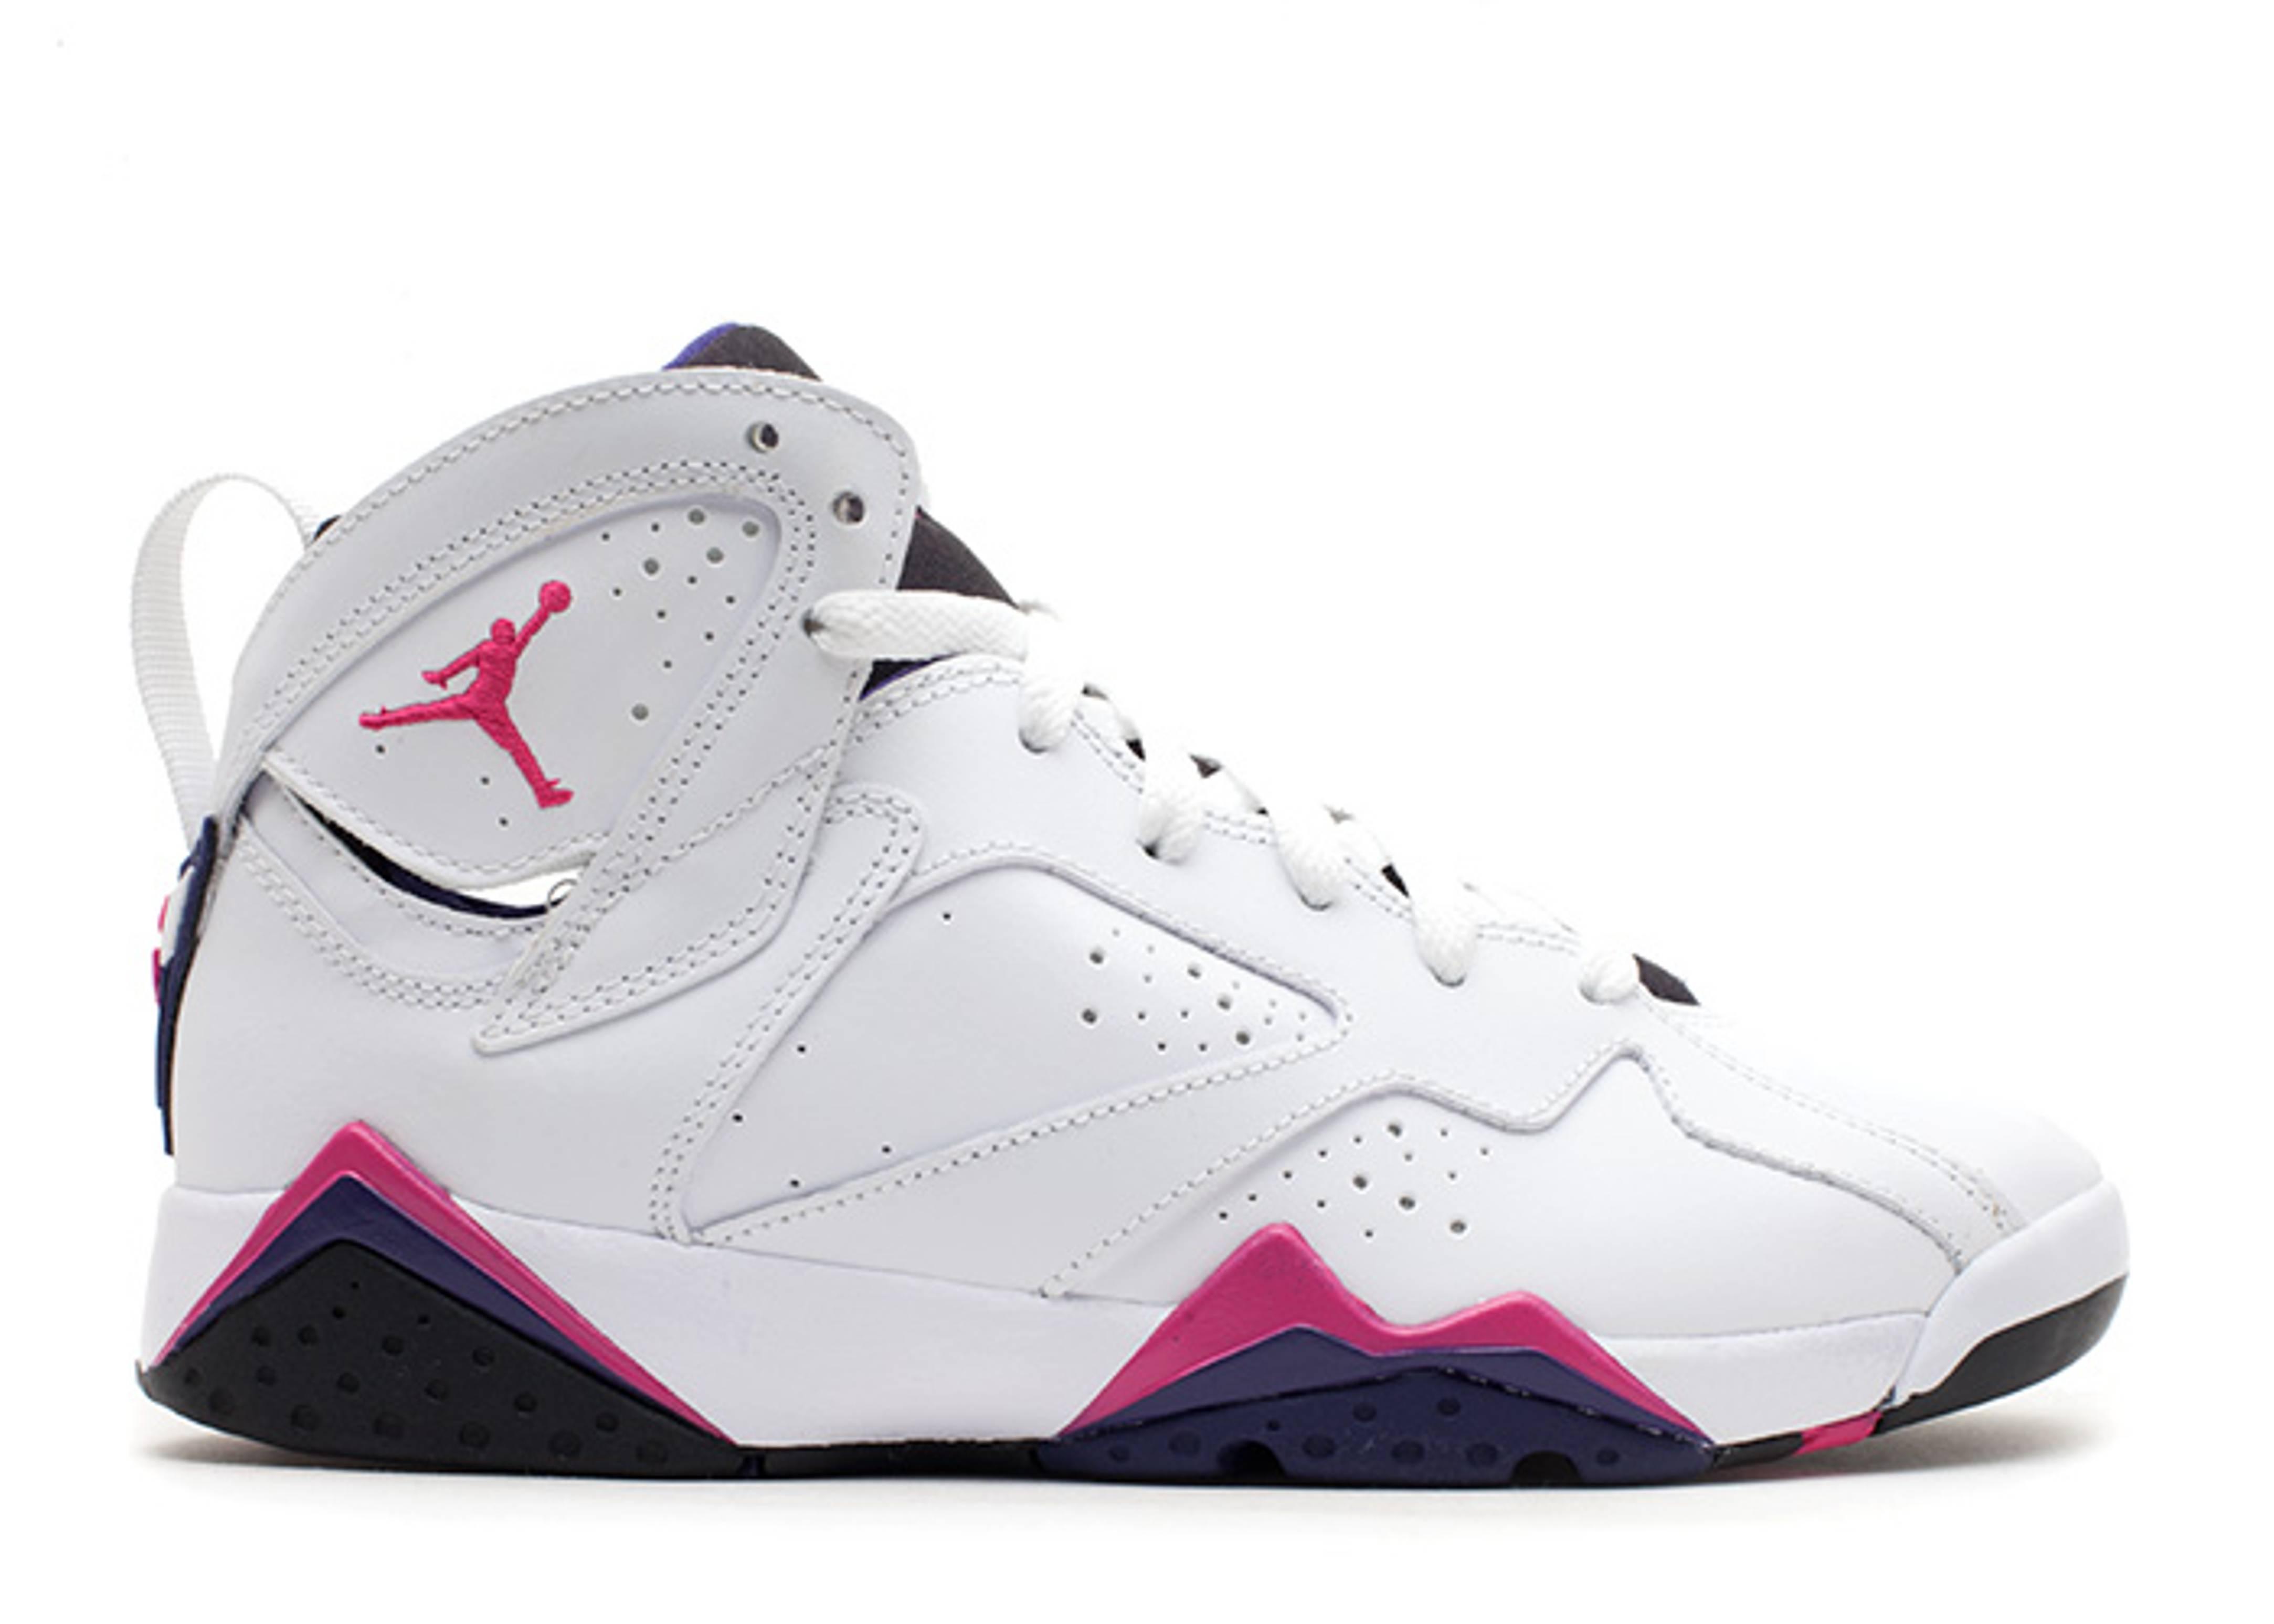 f66b2ae6493104 Girls Air Jordan 7 Retro (gs) - Air Jordan - 442960 117 - white fireberry- black-night bl